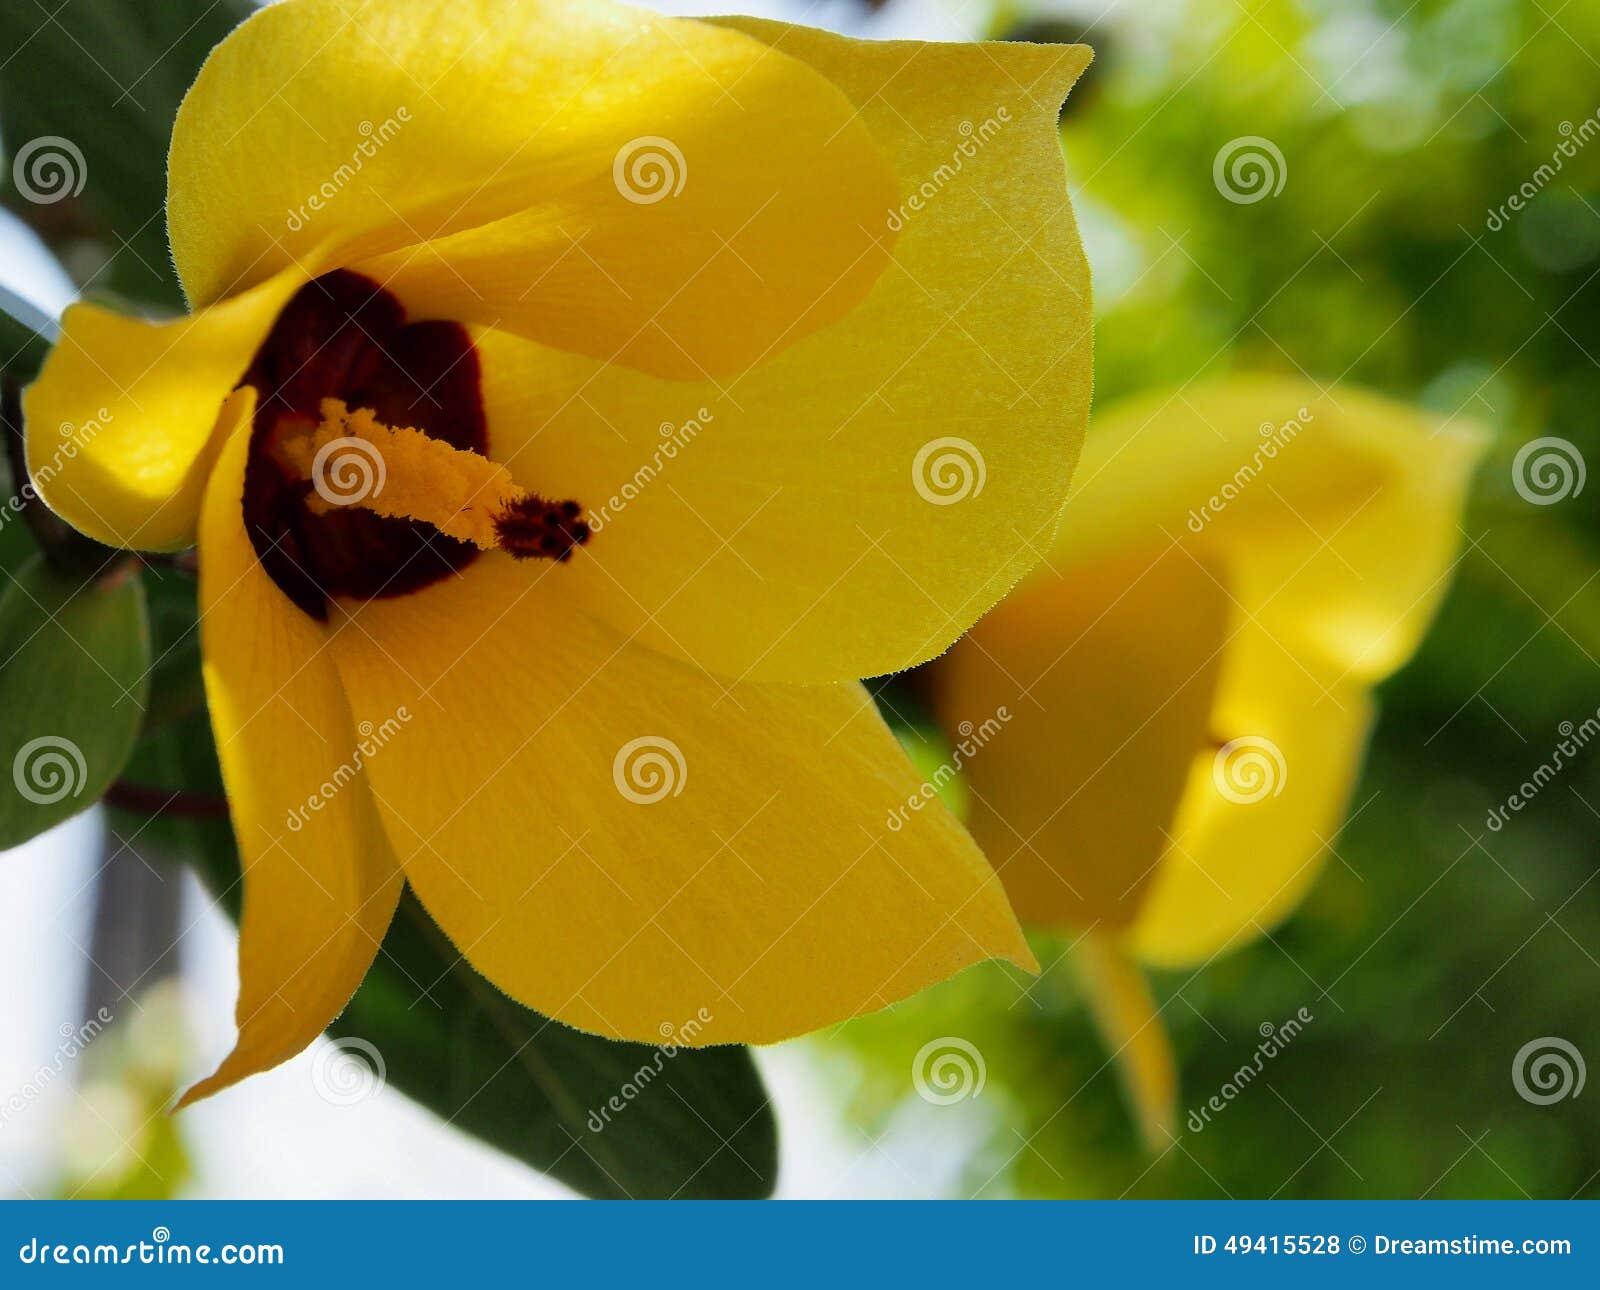 Download Gelbes Blumenmakro stockfoto. Bild von makro, frech, nave - 49415528